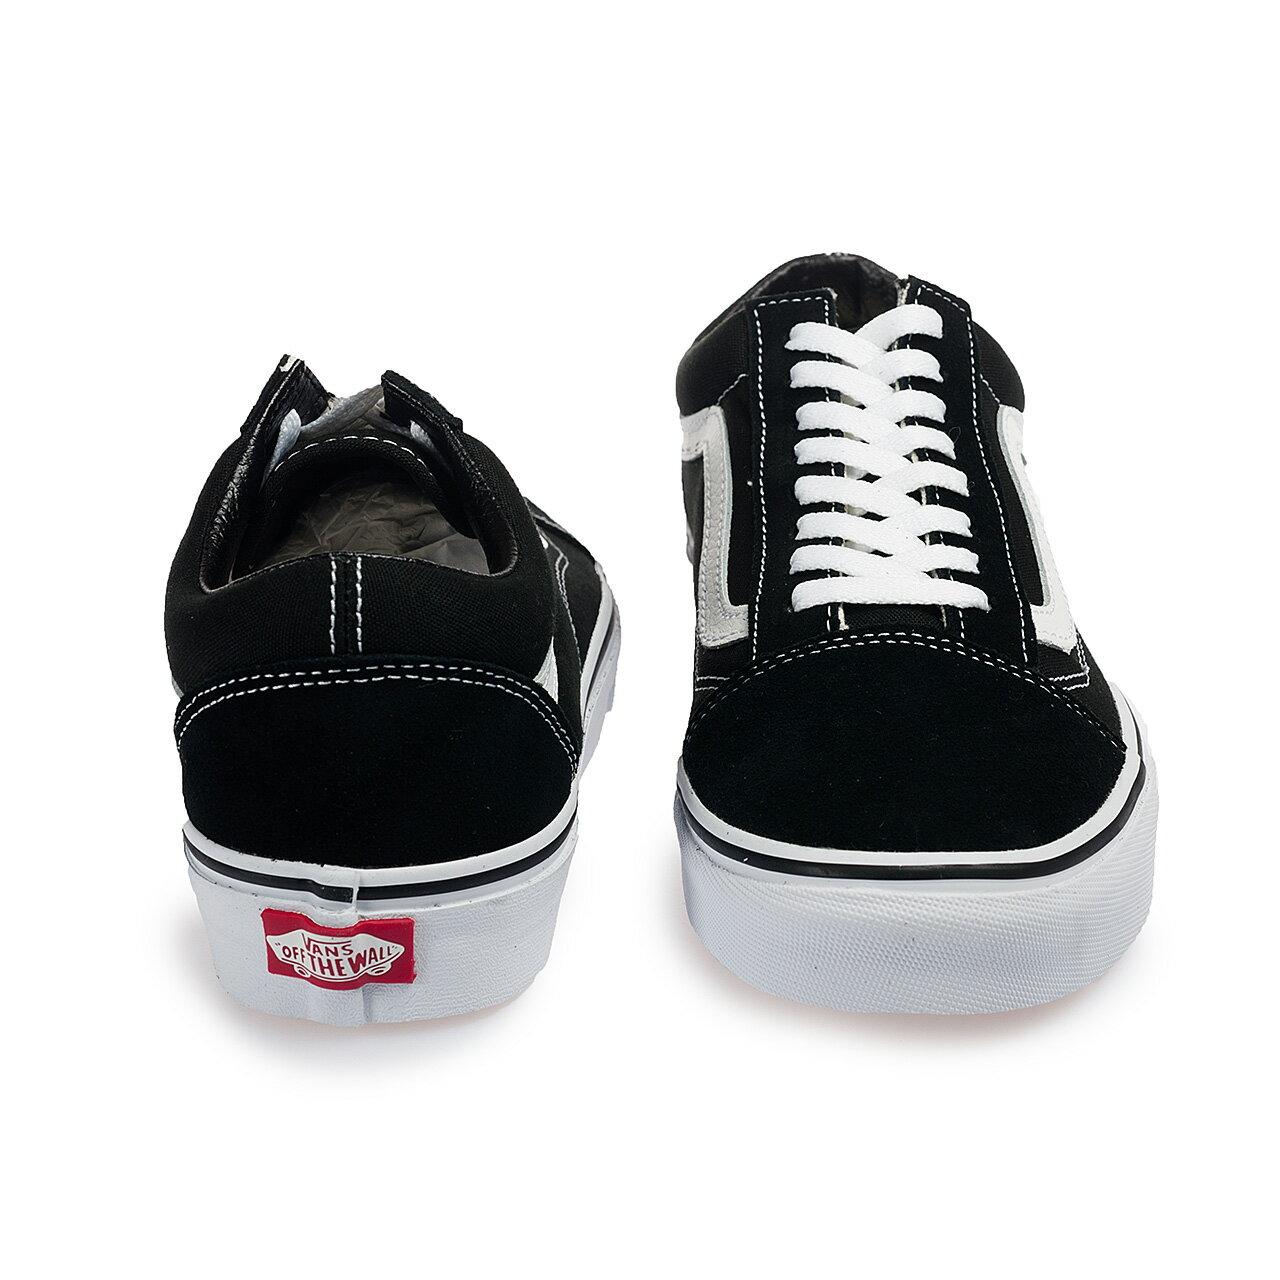 【VANS】 Old Skool 基本款  黑 經典款 休閒鞋 男女 專櫃價2380  VN000D3HY28(palace store) 6